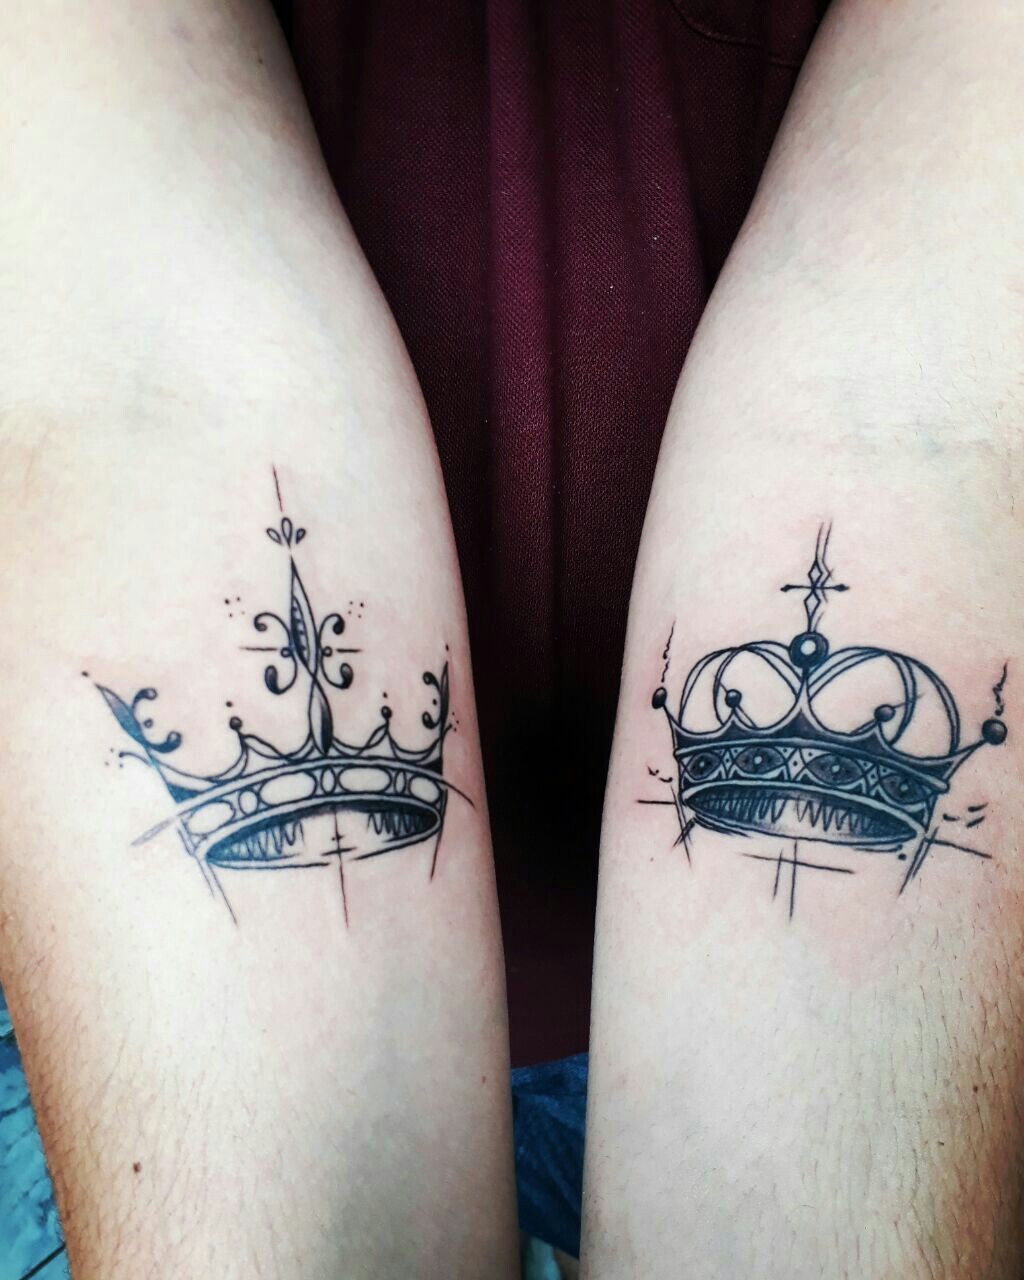 King Queen Matching Tattoos King Tattoos Inspirational Tattoos